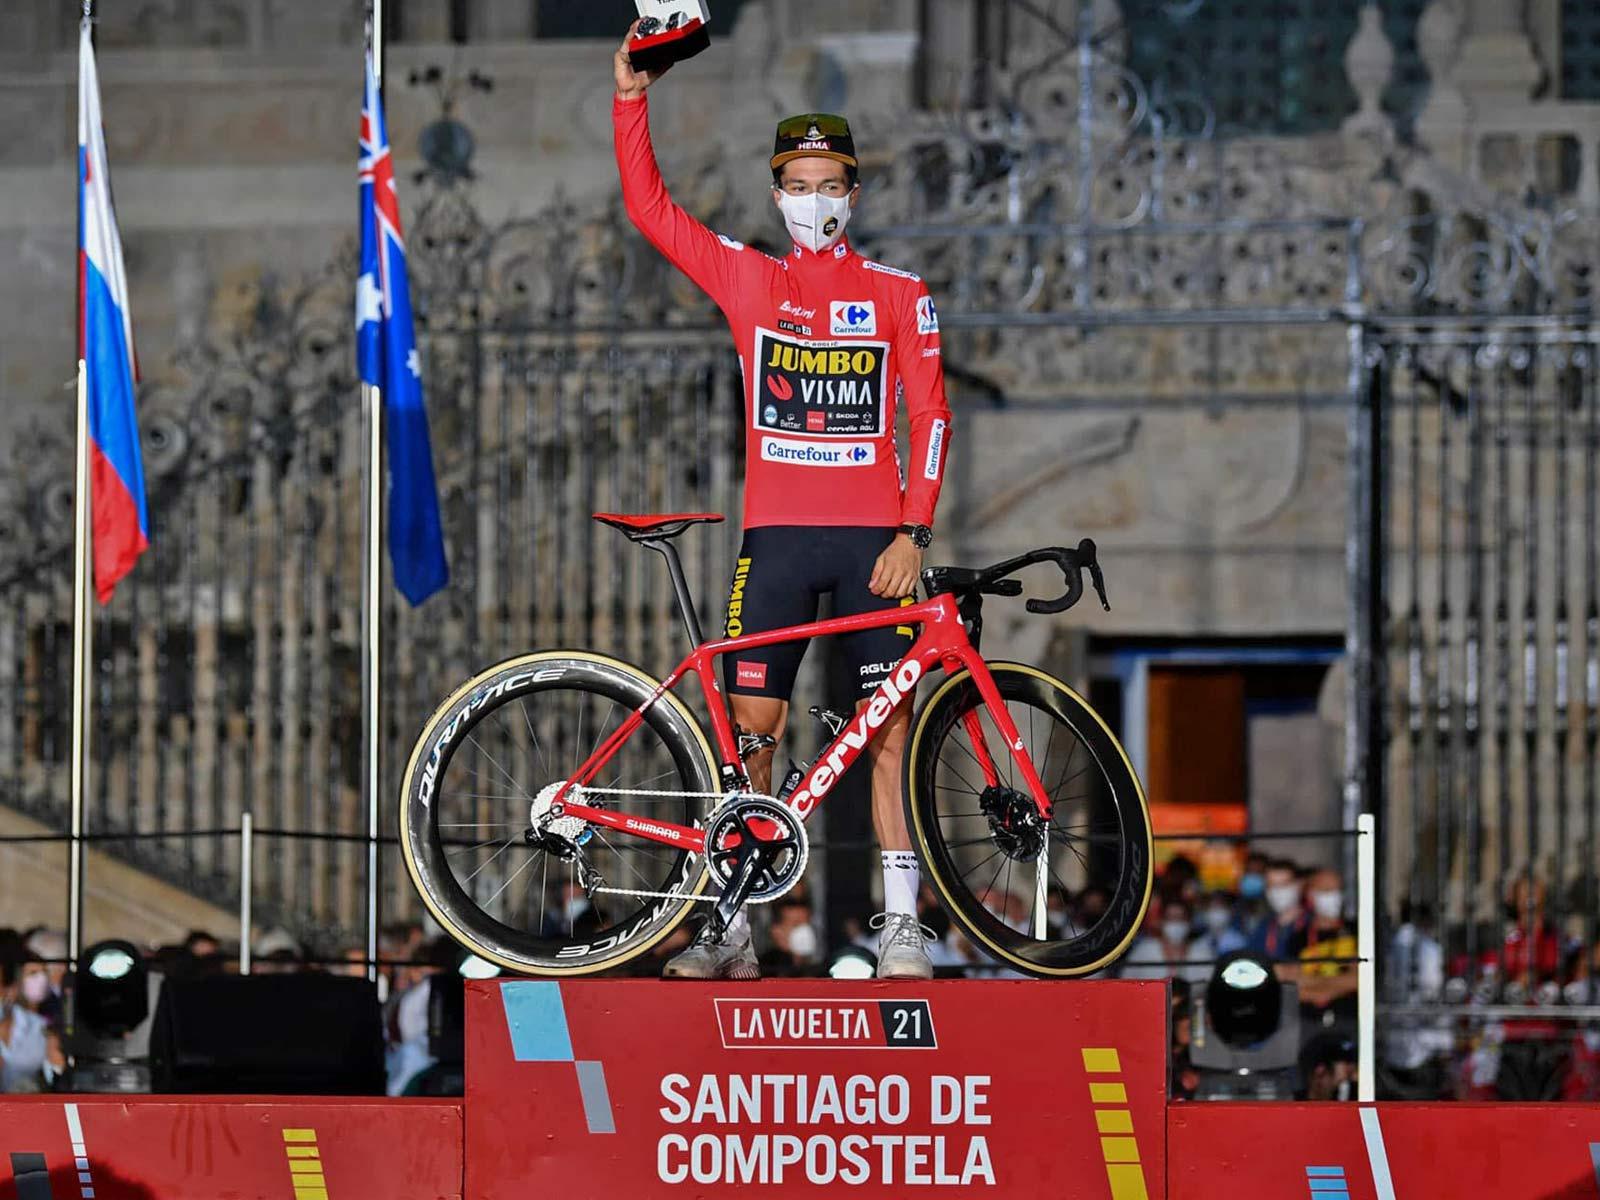 2022 Cervelo R5 Disc lightweight carbon all-rounder classic road bike,Vuelta winner